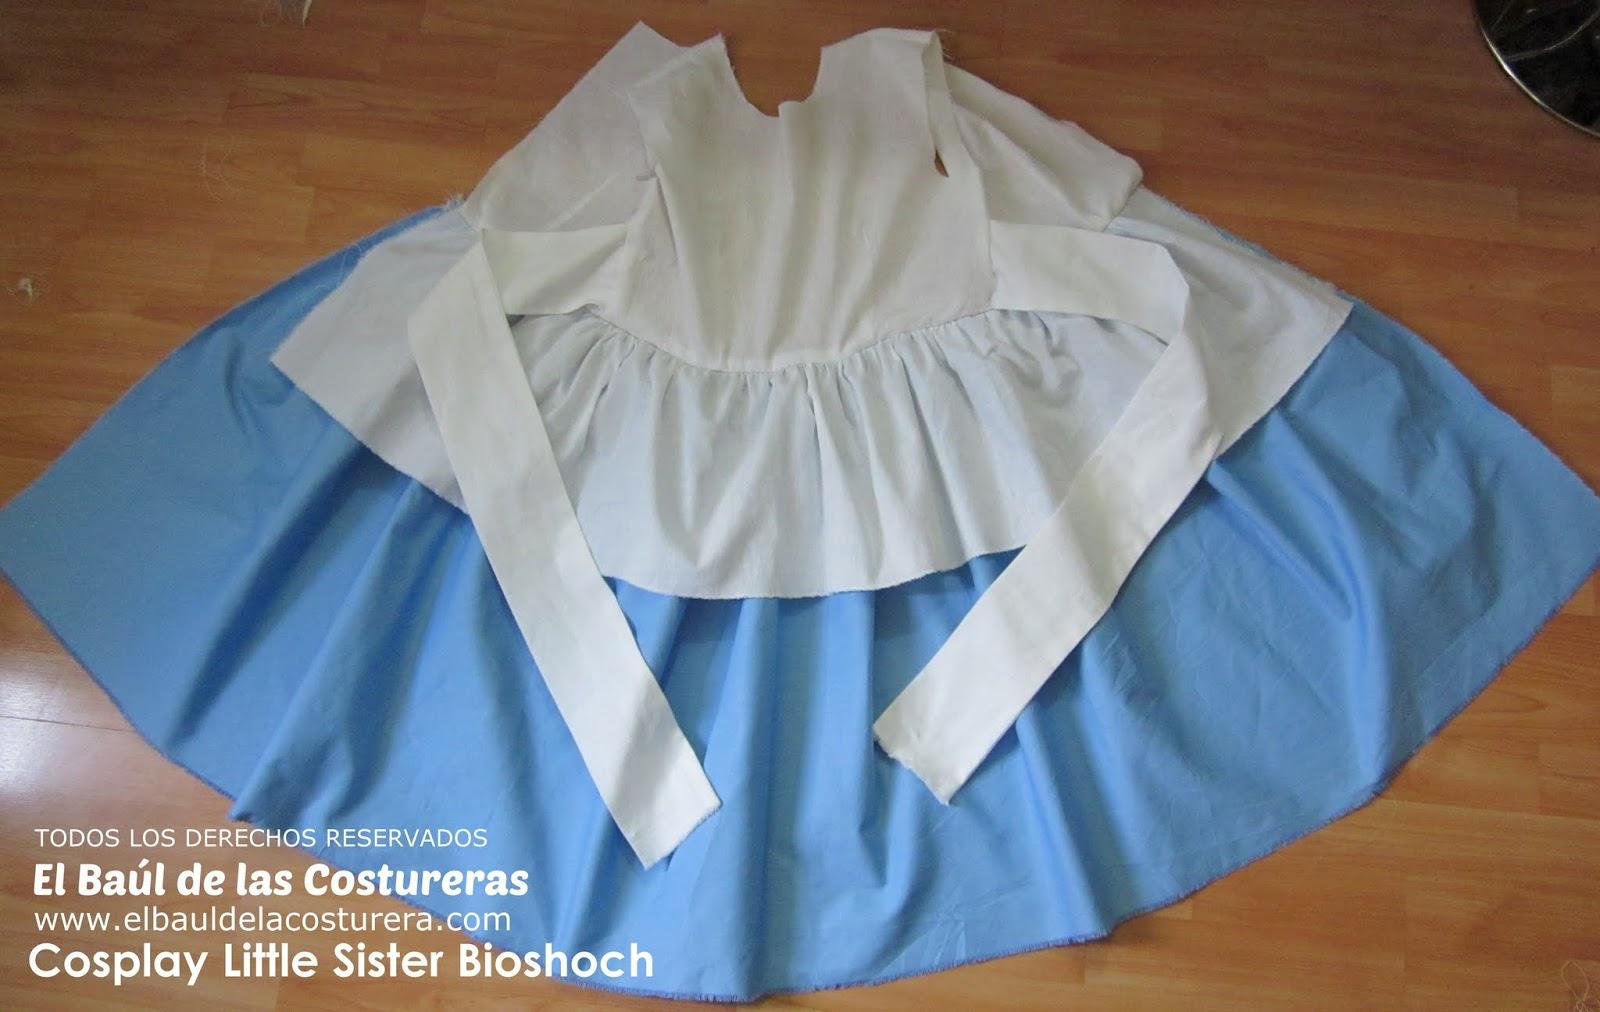 baul costureras Tutorial cosplay little sister bioshock